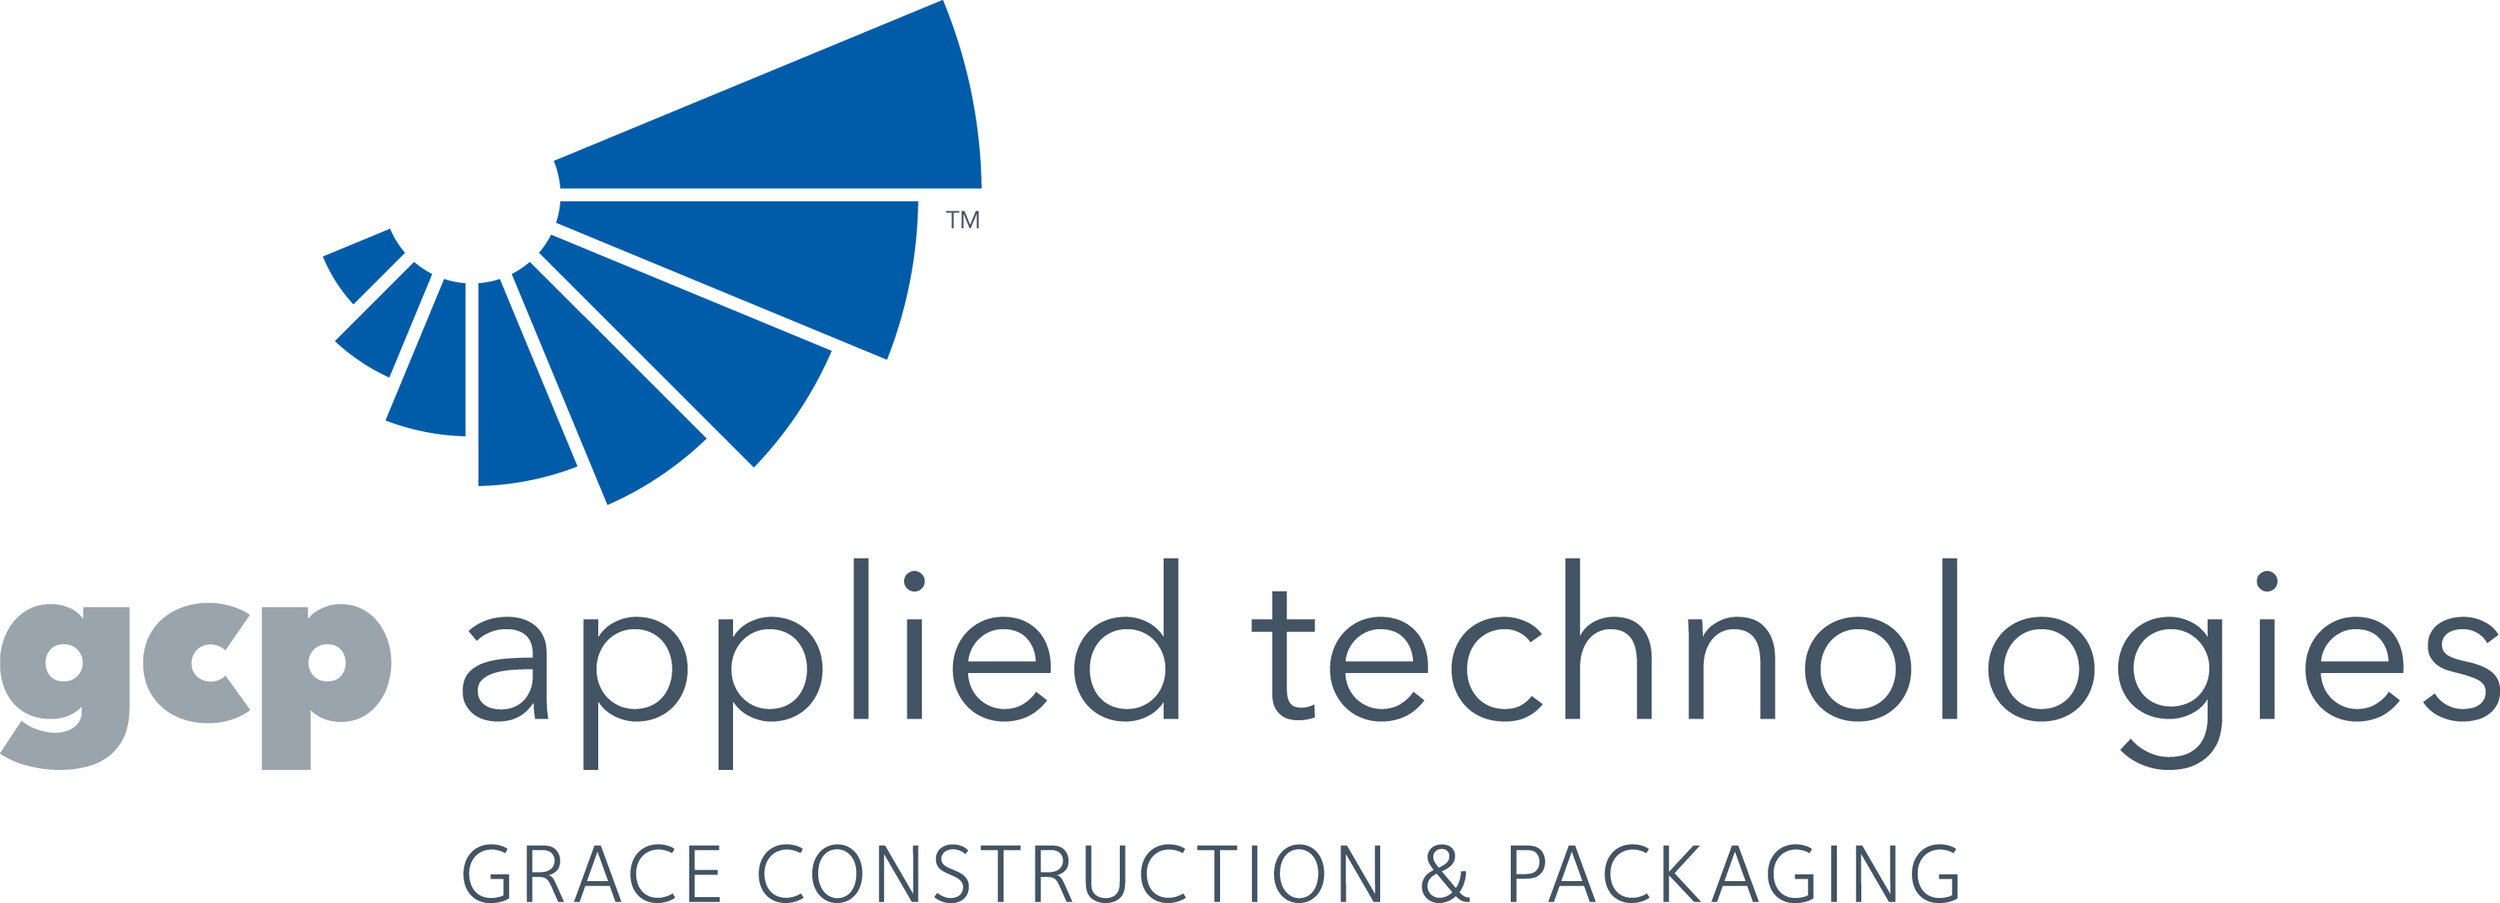 GCP-Applied-Technologies-Logo-H-3-color.jpg